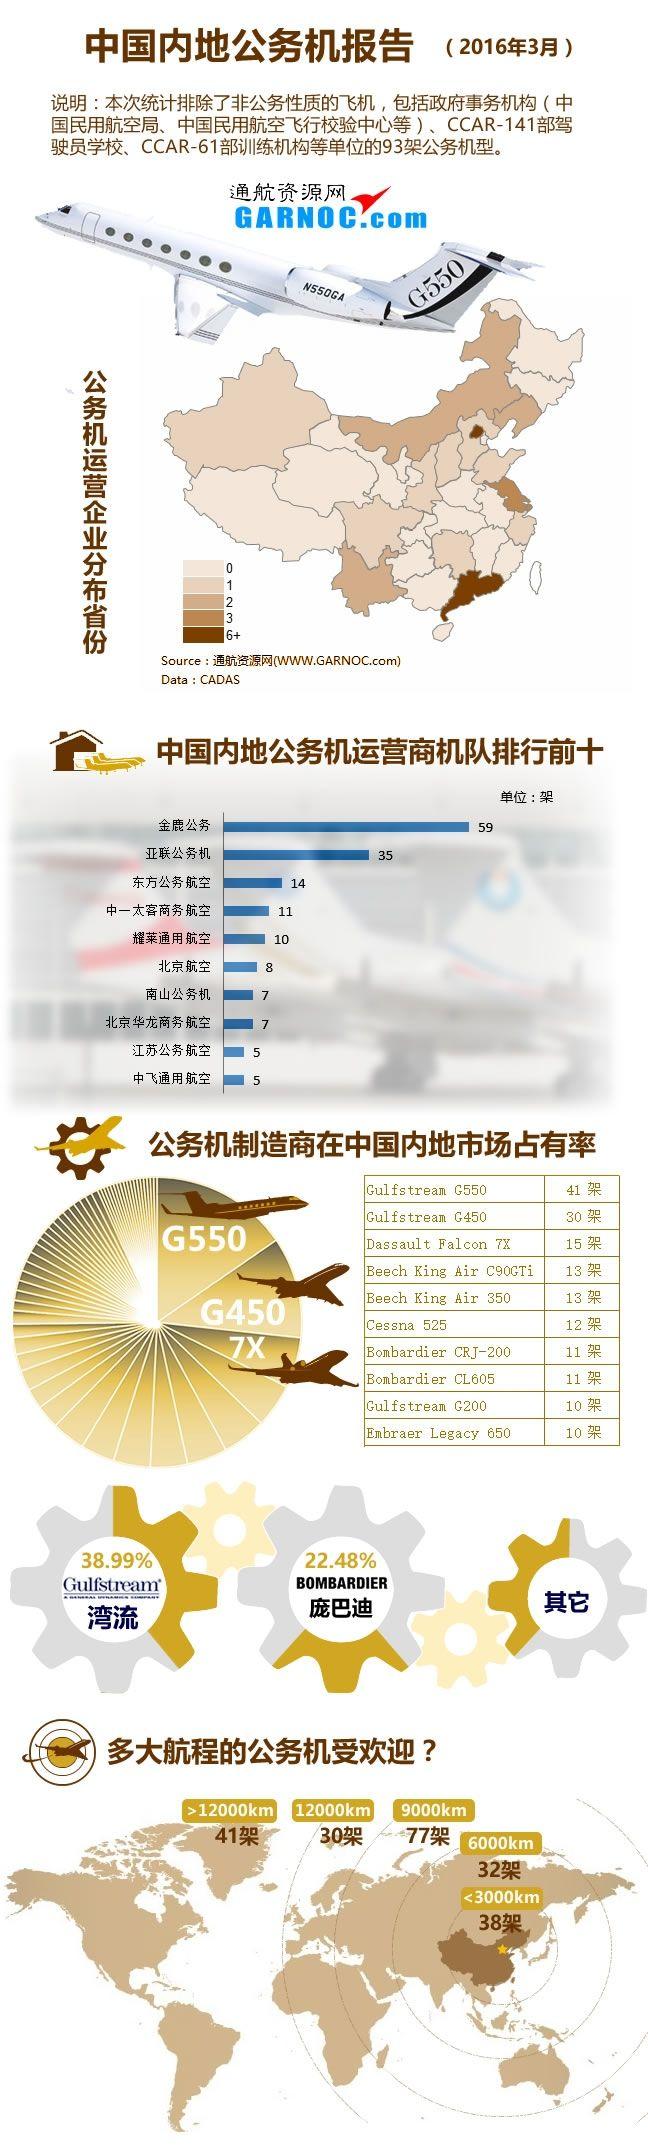 GARNOC发布《2016中国内地公务机报告》